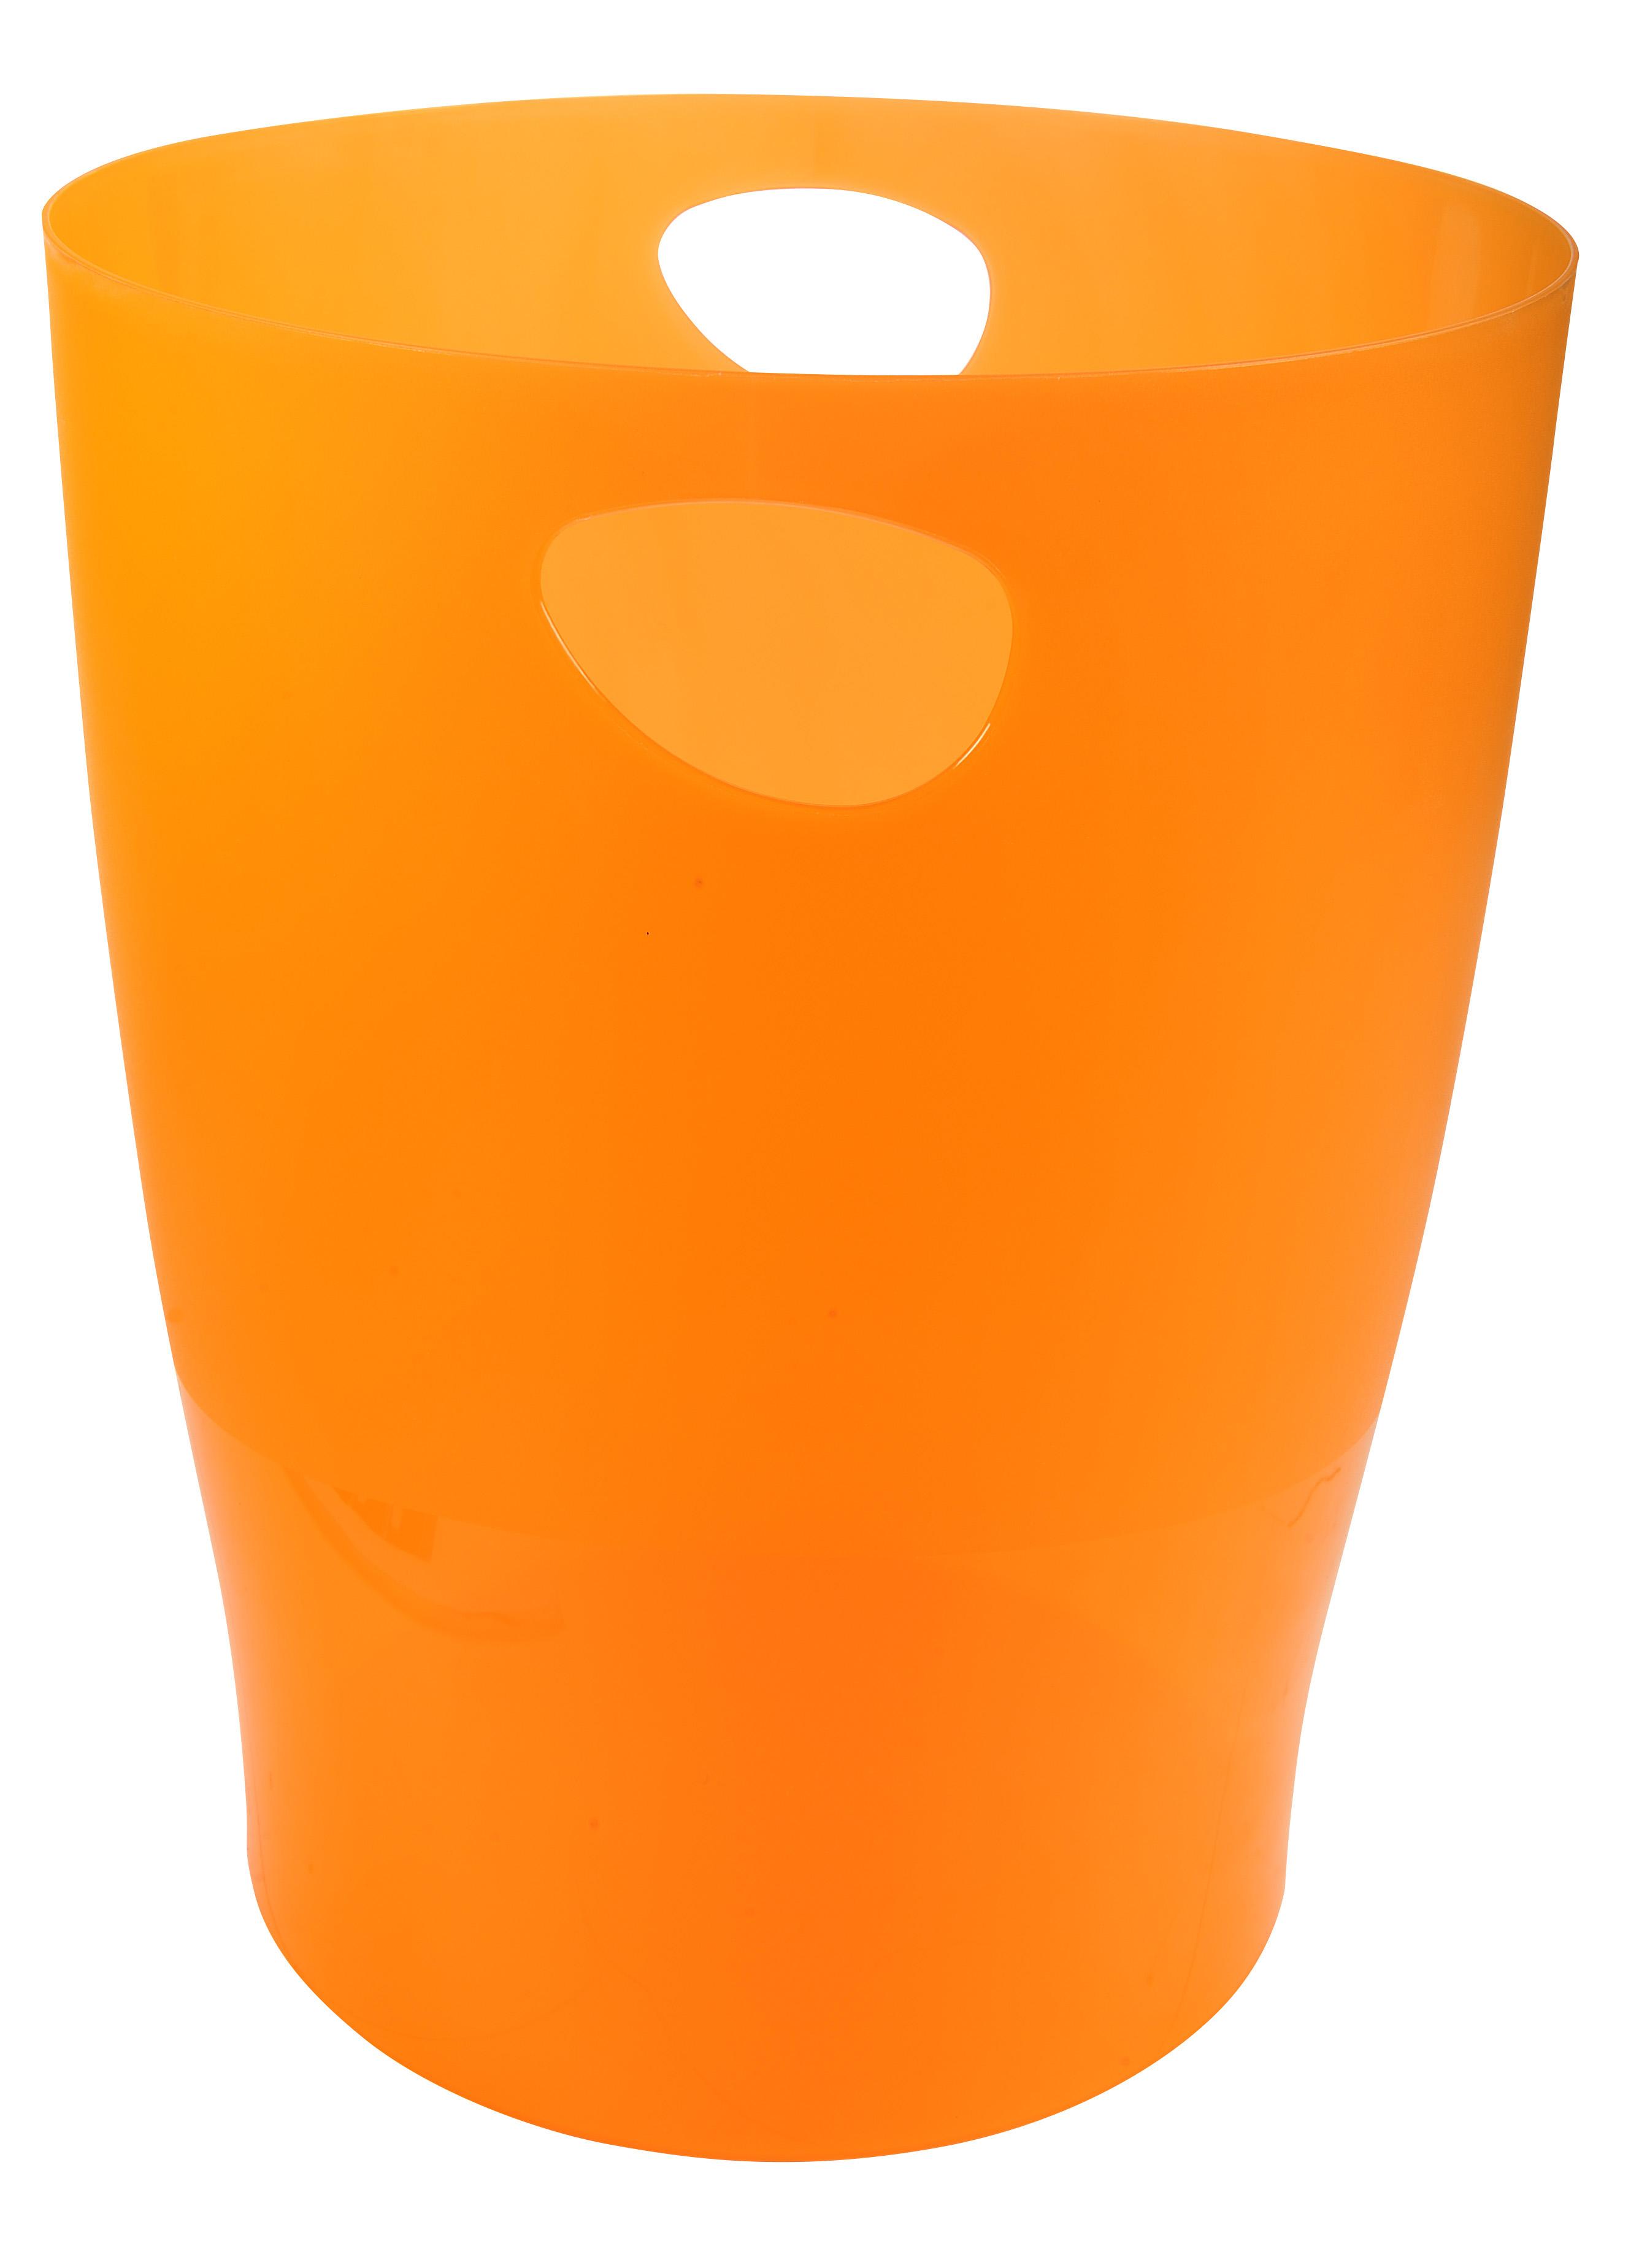 Rubbish Bins Exacompta ECOBIN 263x263x335mm Orange 45352D